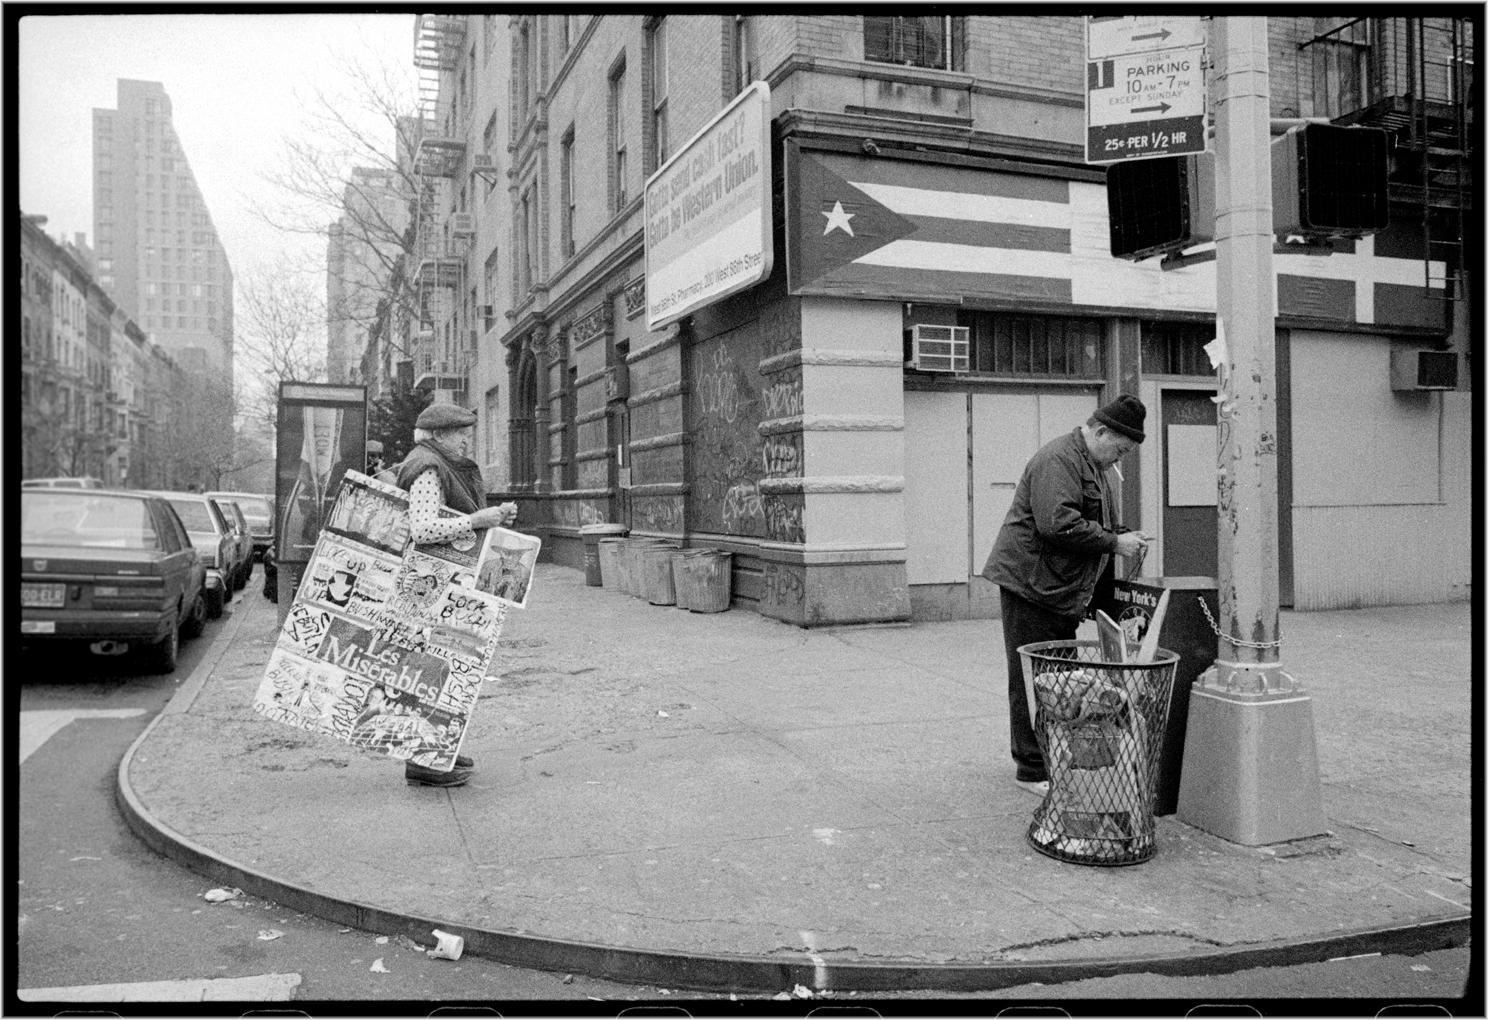 88thStreet-Columbus-1991 copy